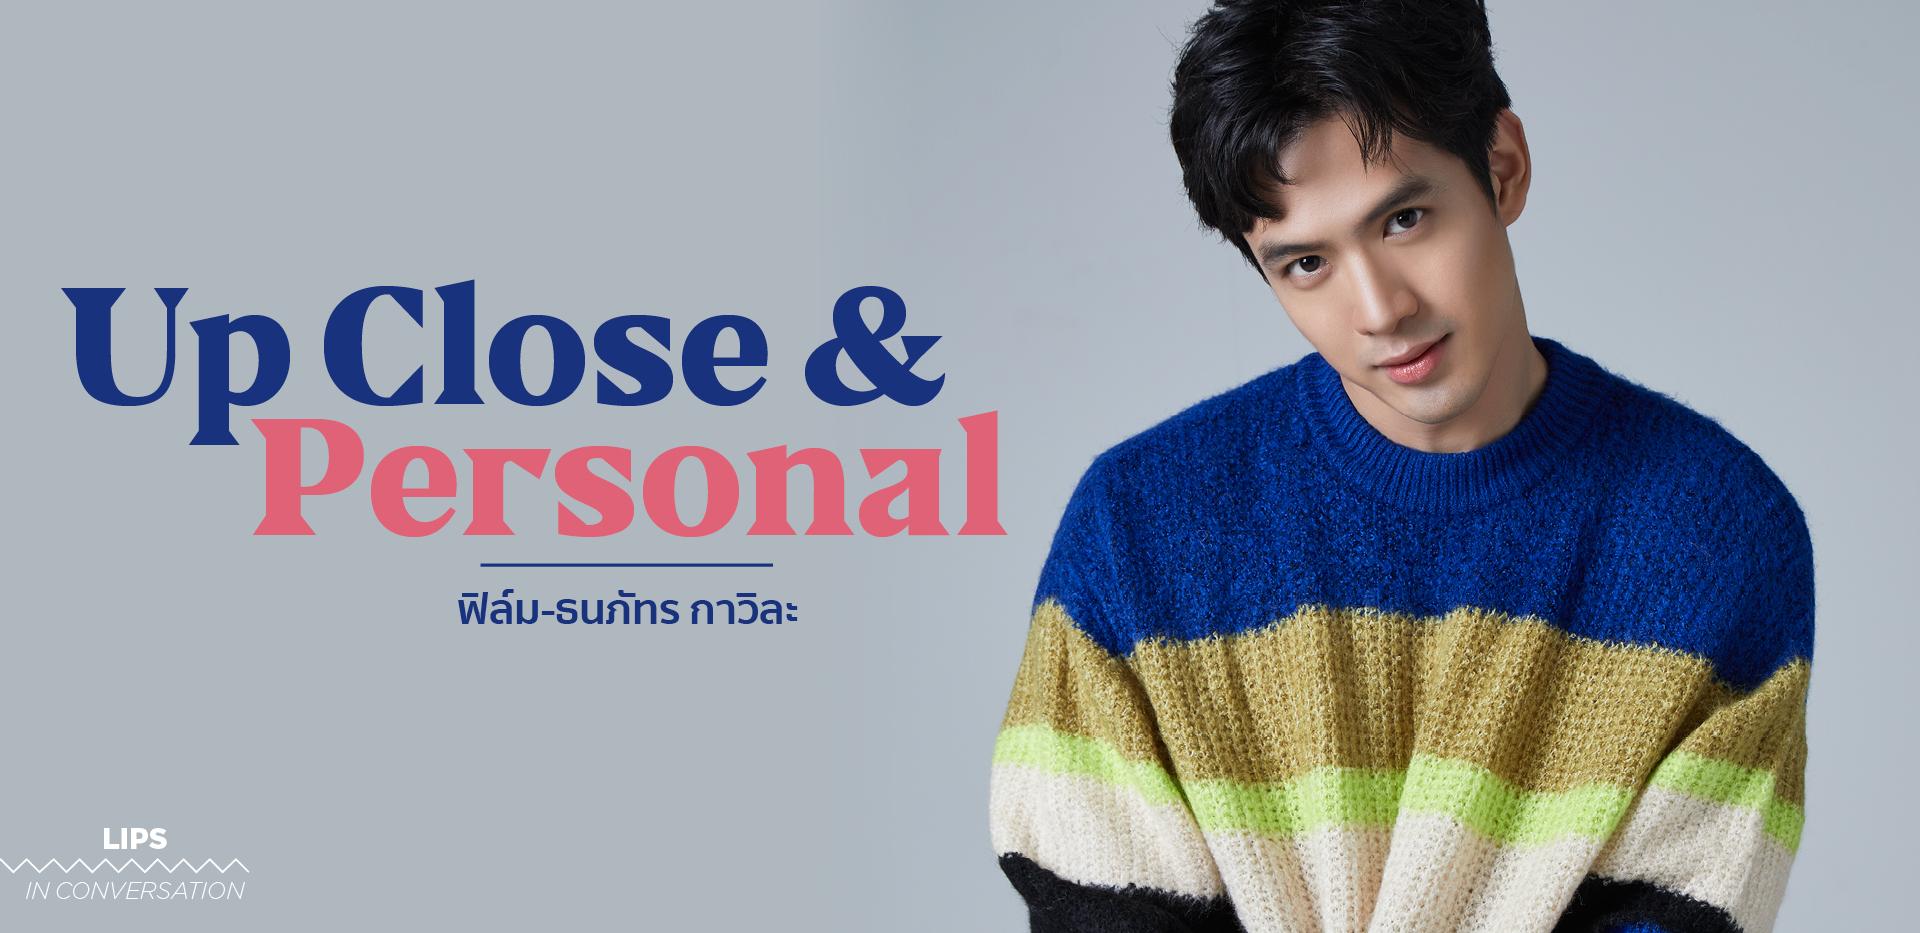 Up  Close & Personal – ฟิล์ม-ธนภัทร กาวิละ